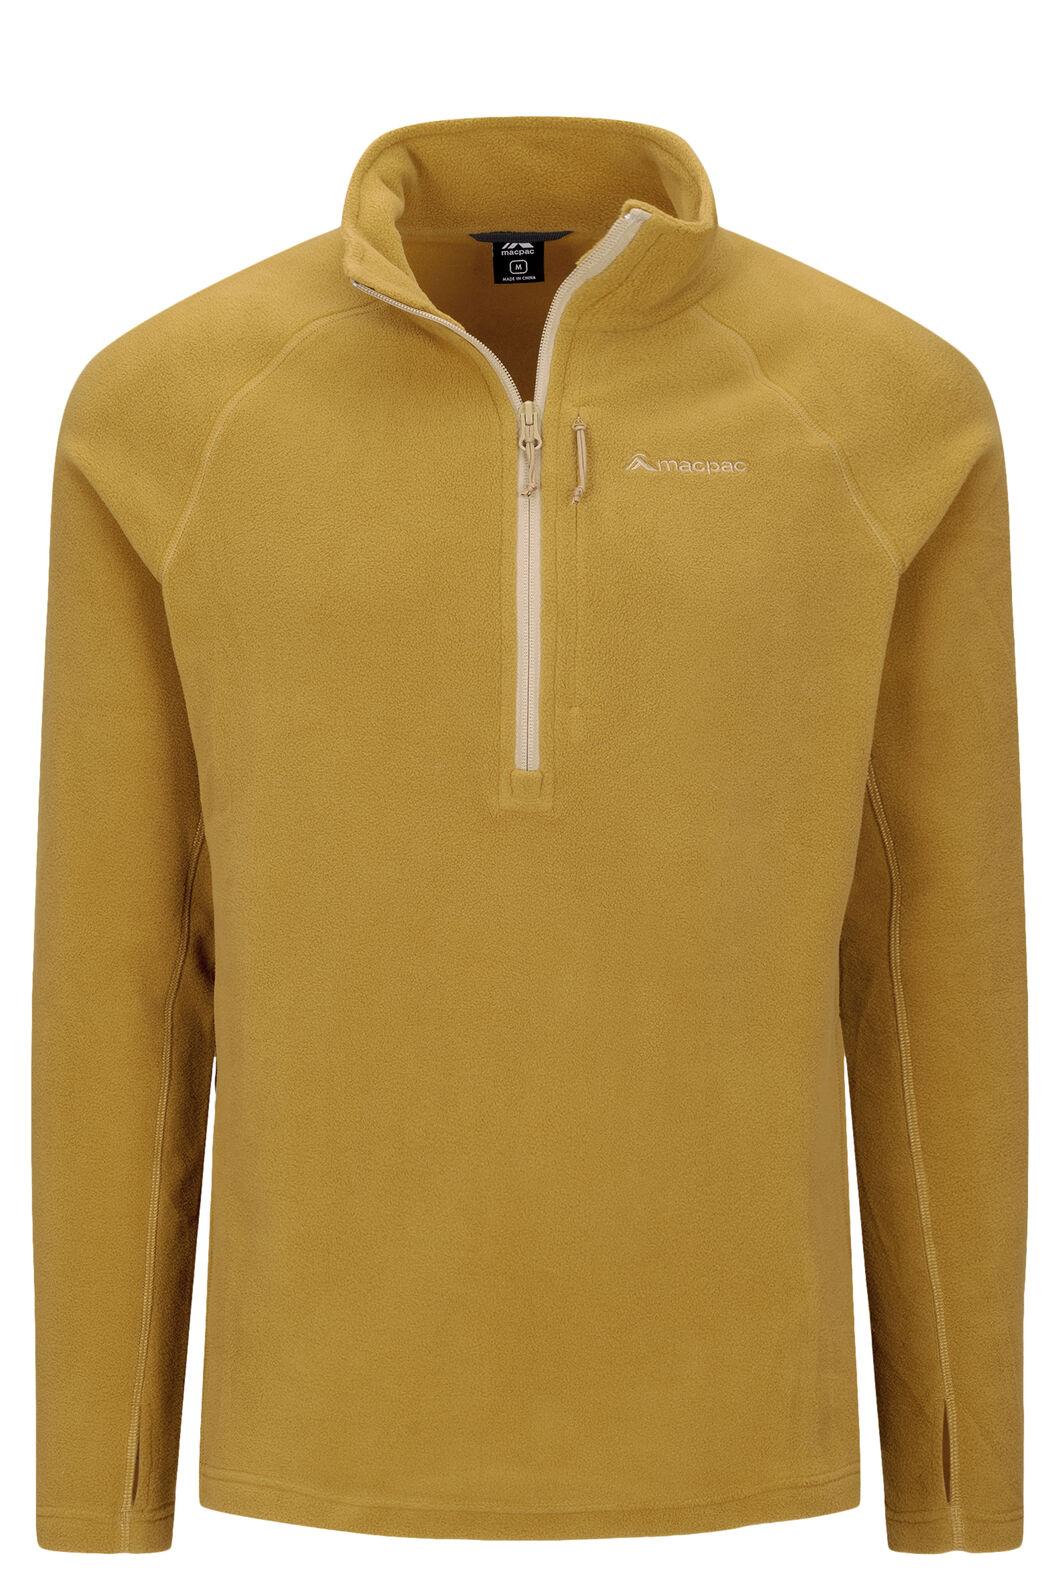 Macpac Tui Polartec® Micro Fleece® Pullover — Men's, Dried Tussock, hi-res